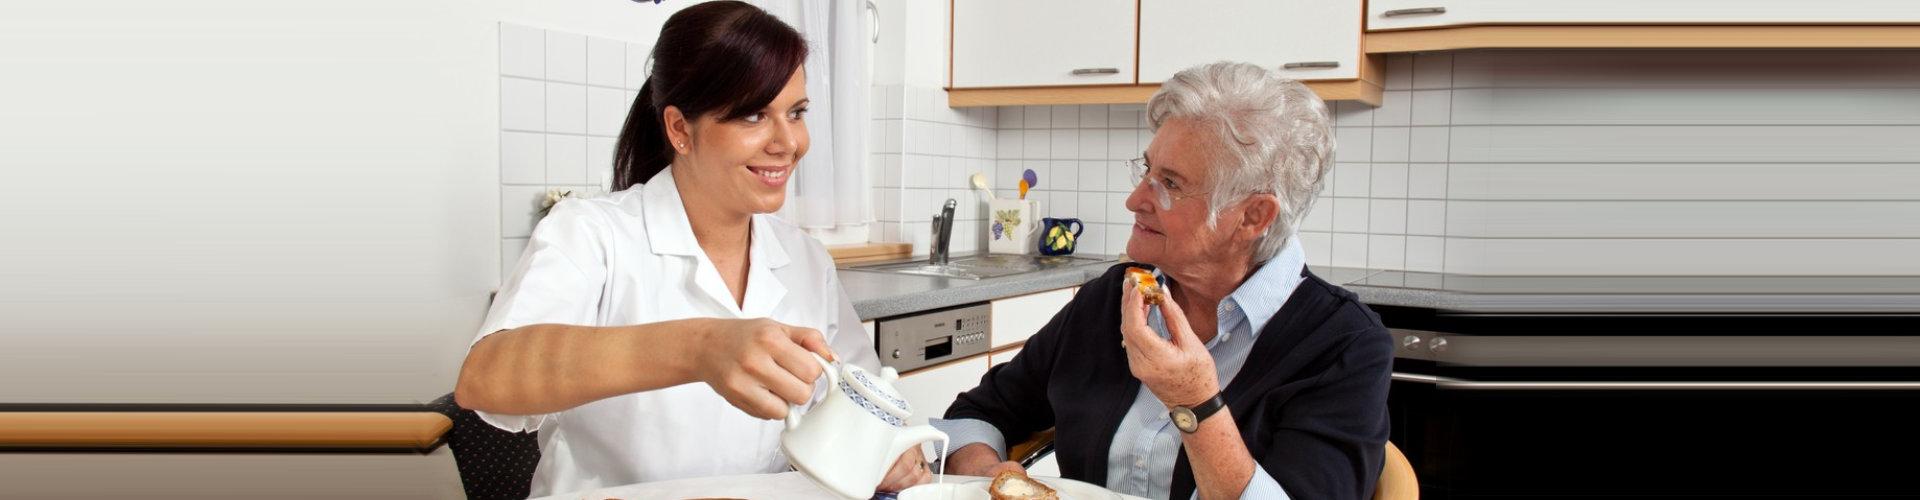 caregiver serving a food to senior woman